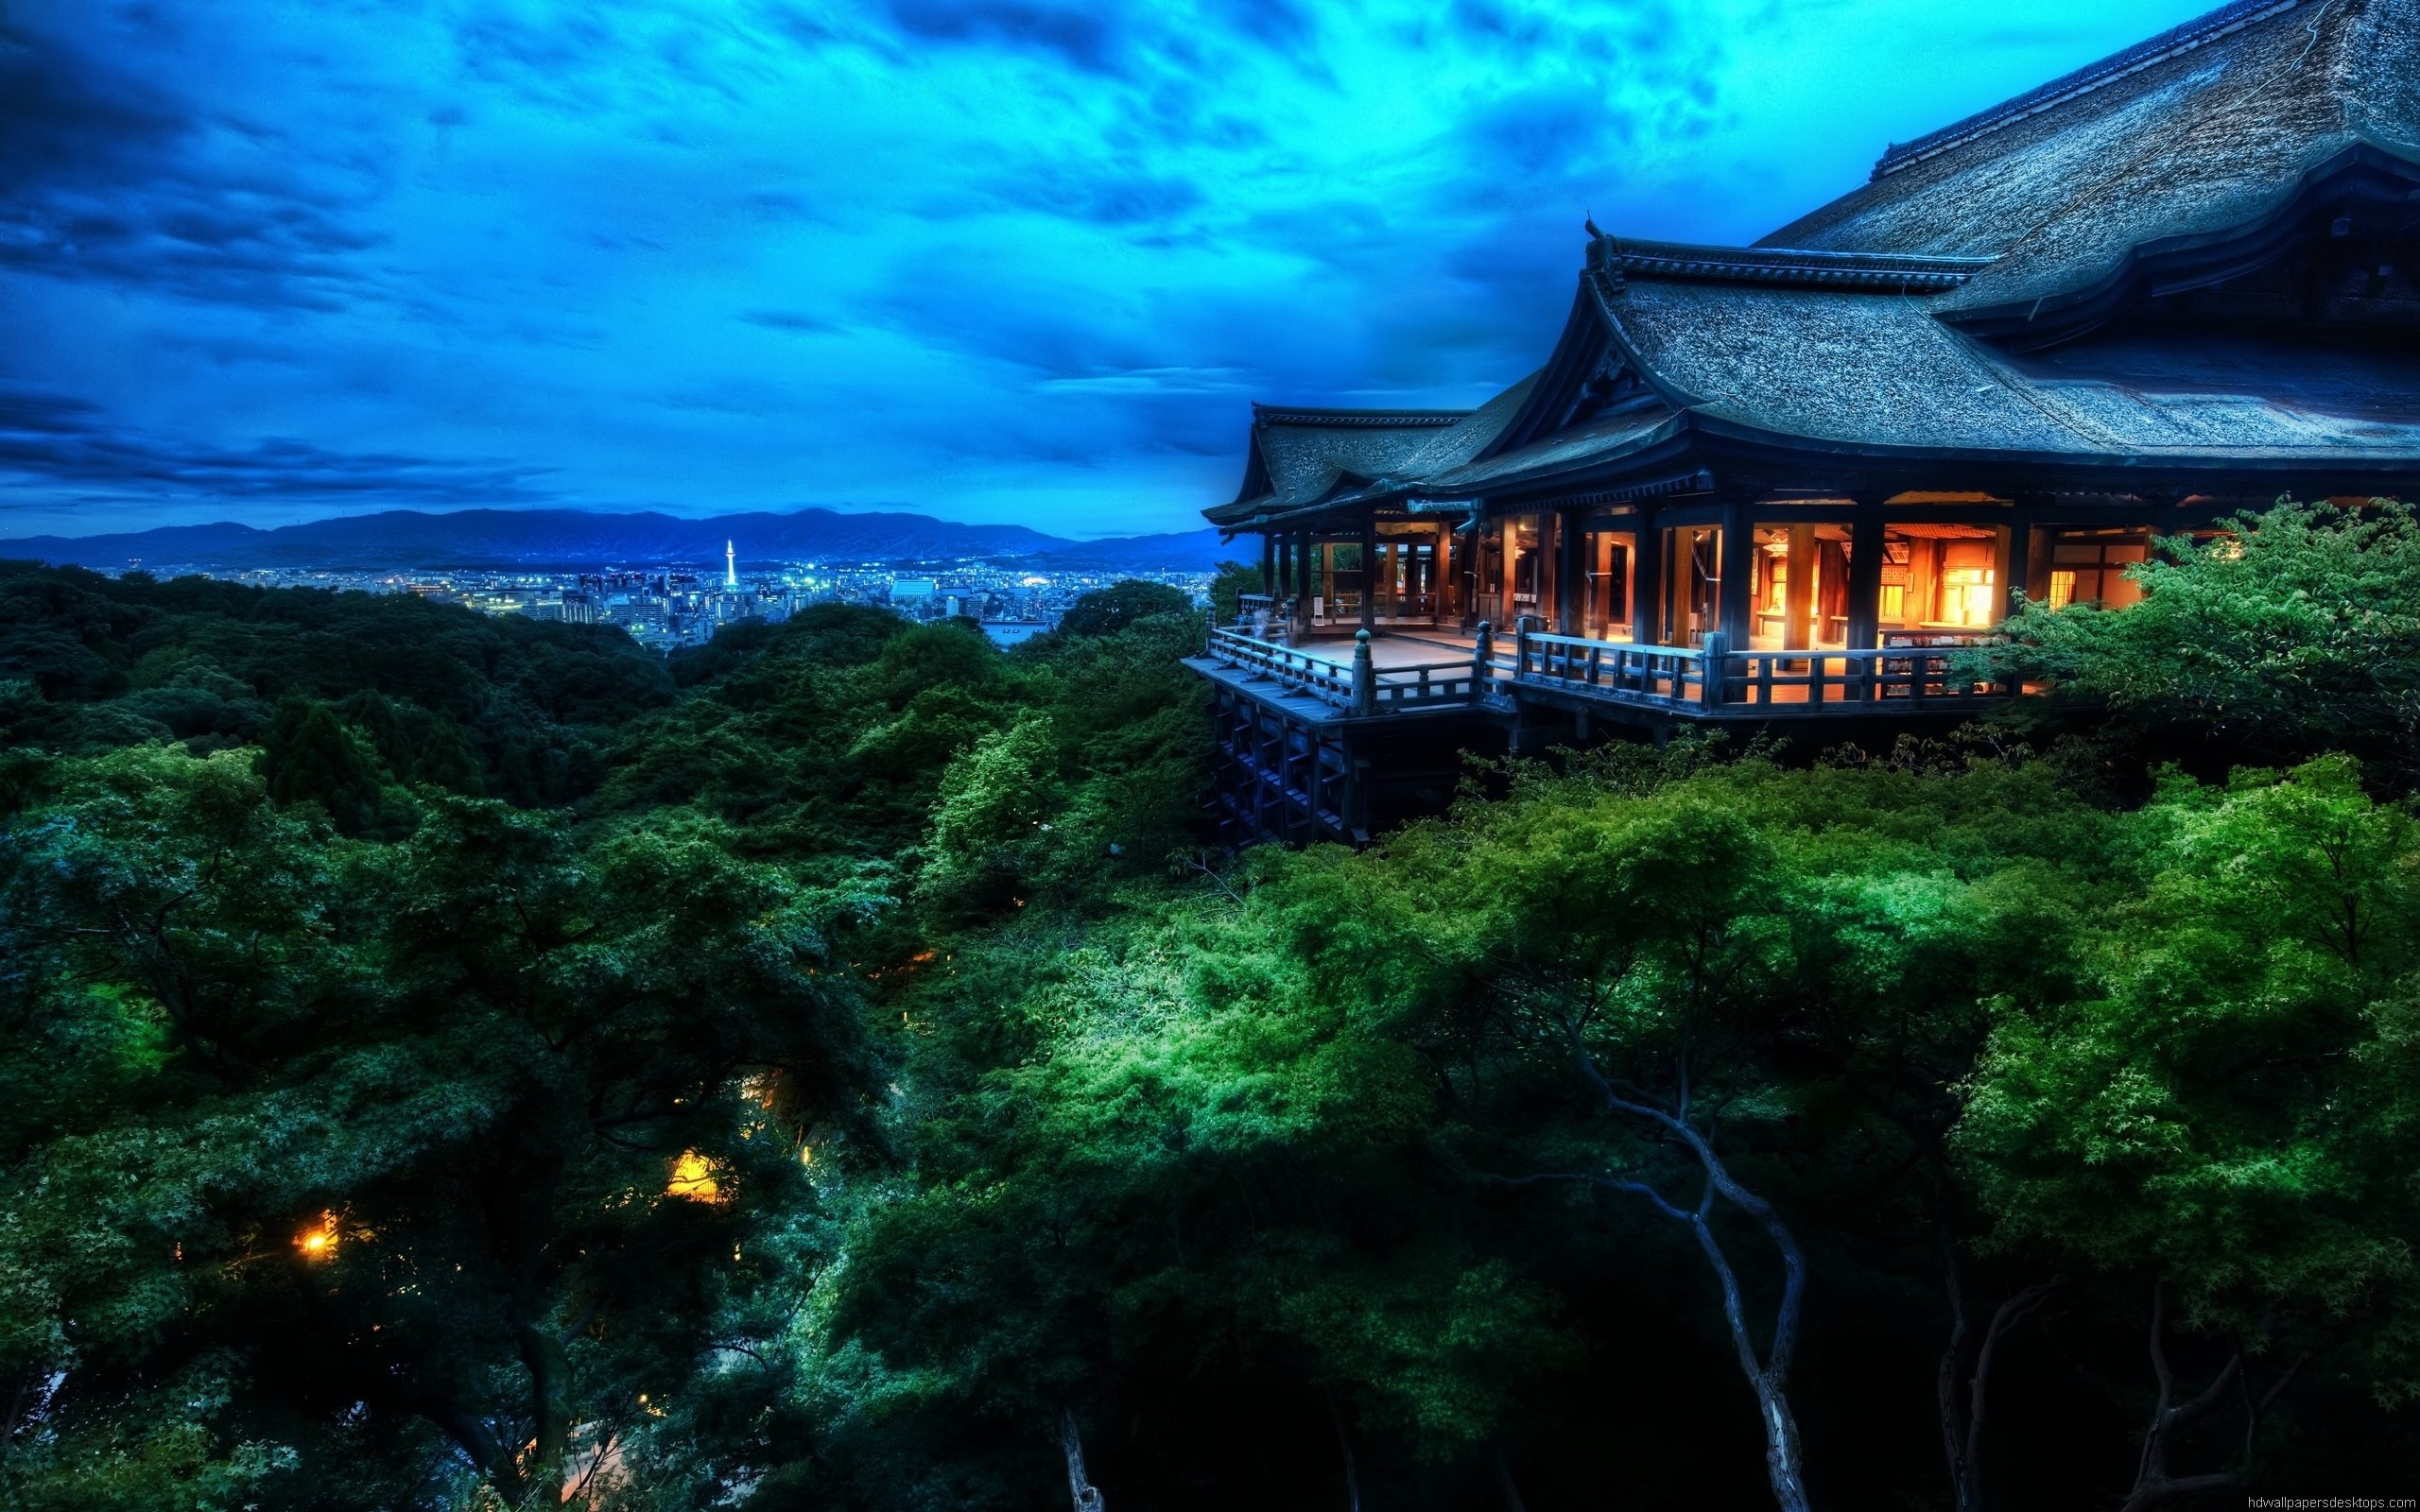 Desktop Backgrounds Kyoto Japan 2560x1600 pixel Popular HD Wallpaper 2560x1600